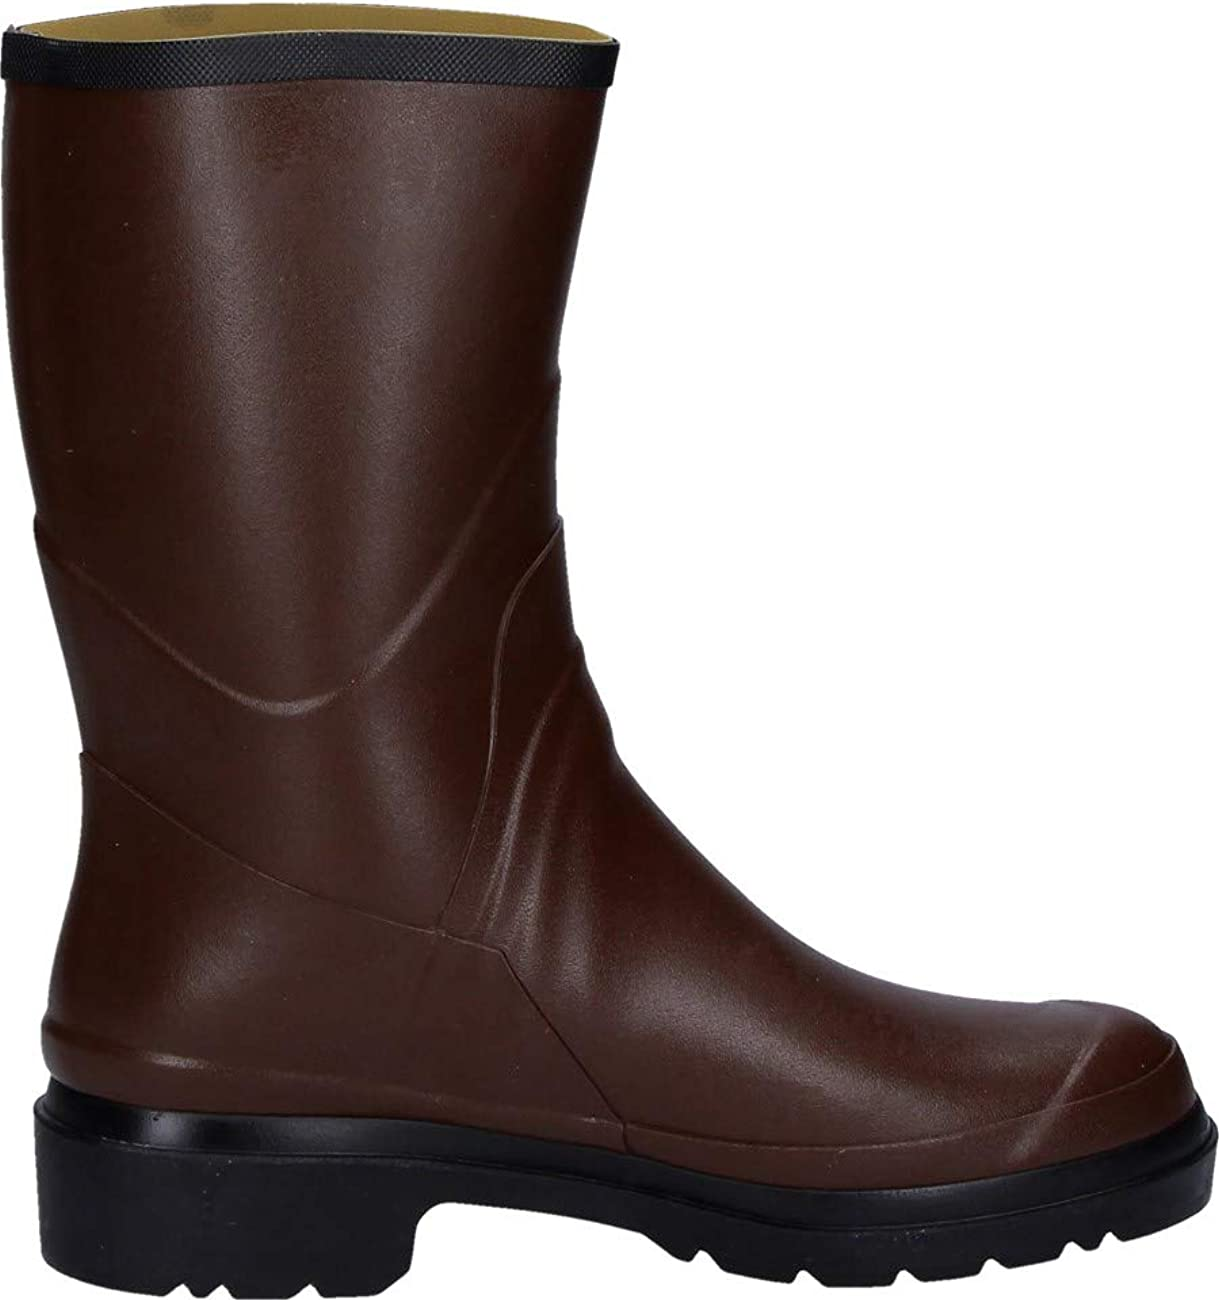 Aigle Men's Bison Rain Boot Marron